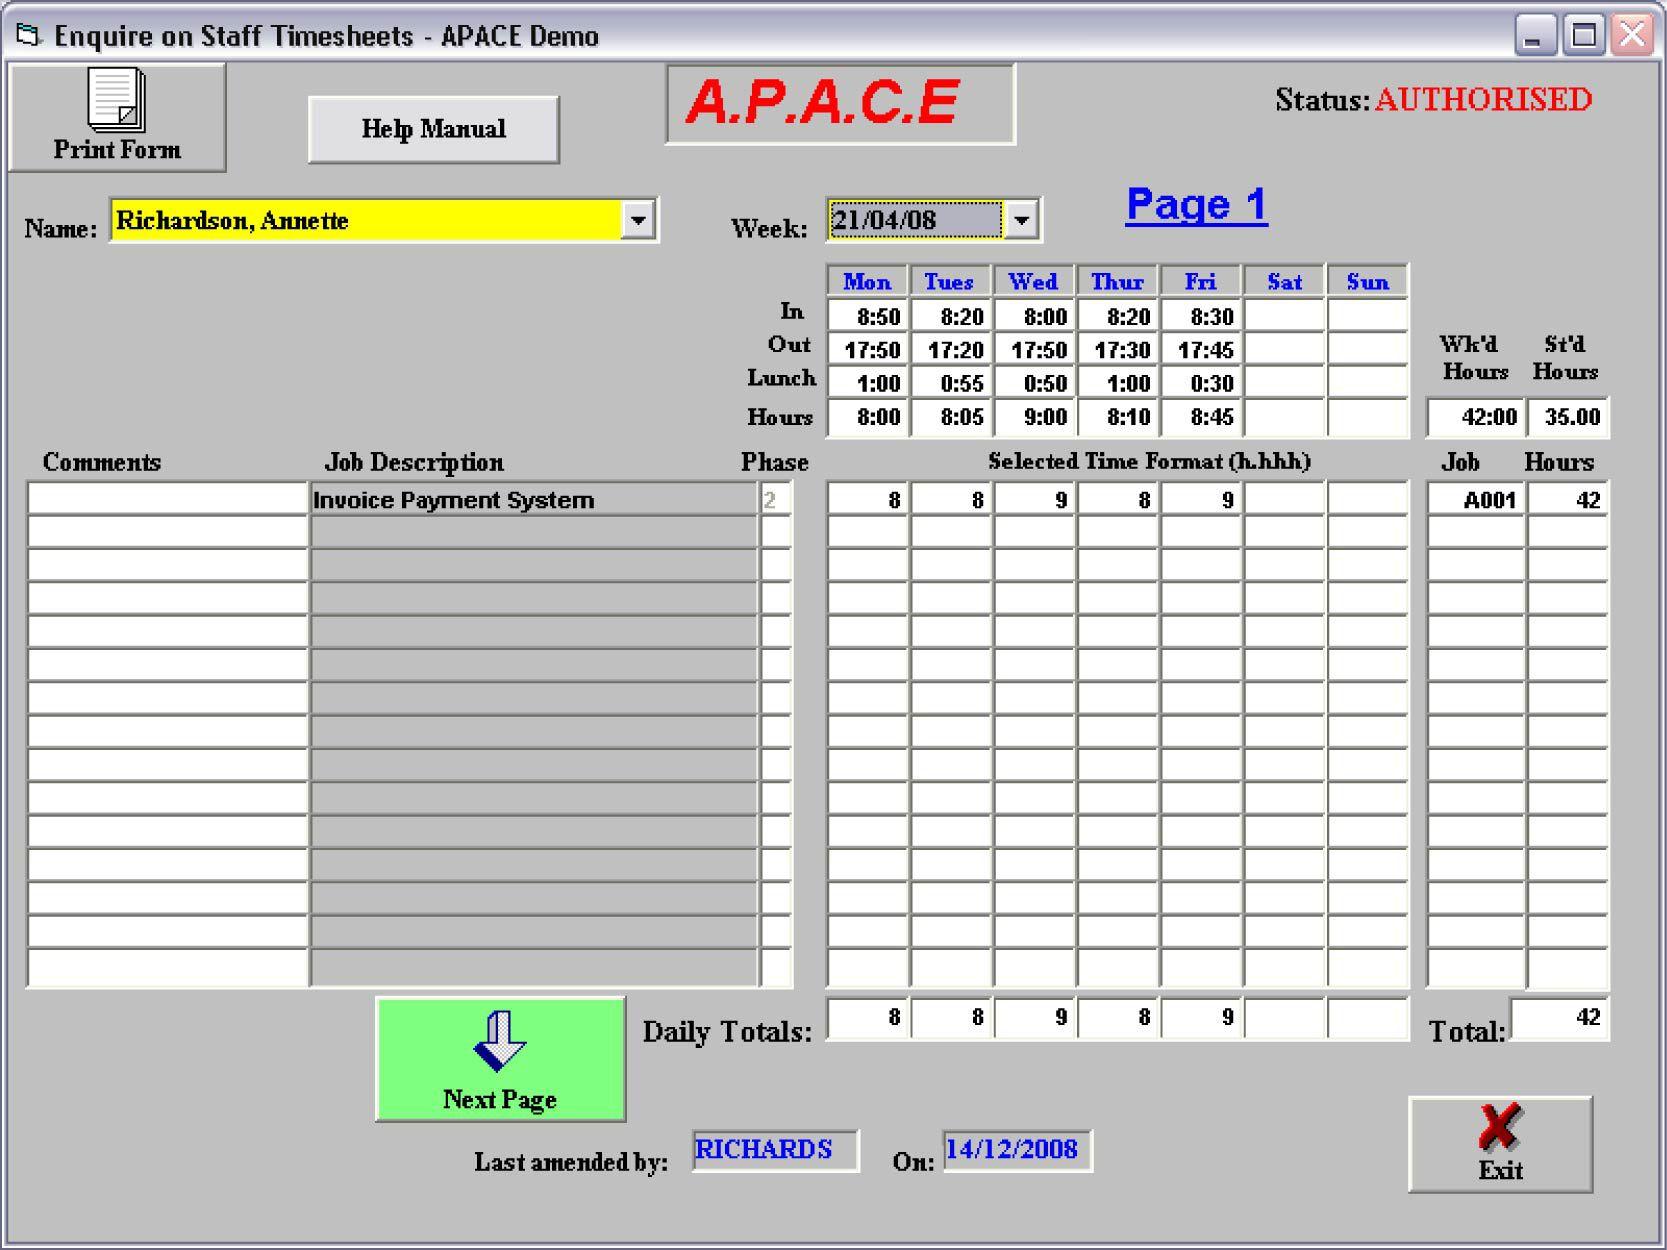 001 Awful Microsoft Acces Employee Time Card Template Idea Full